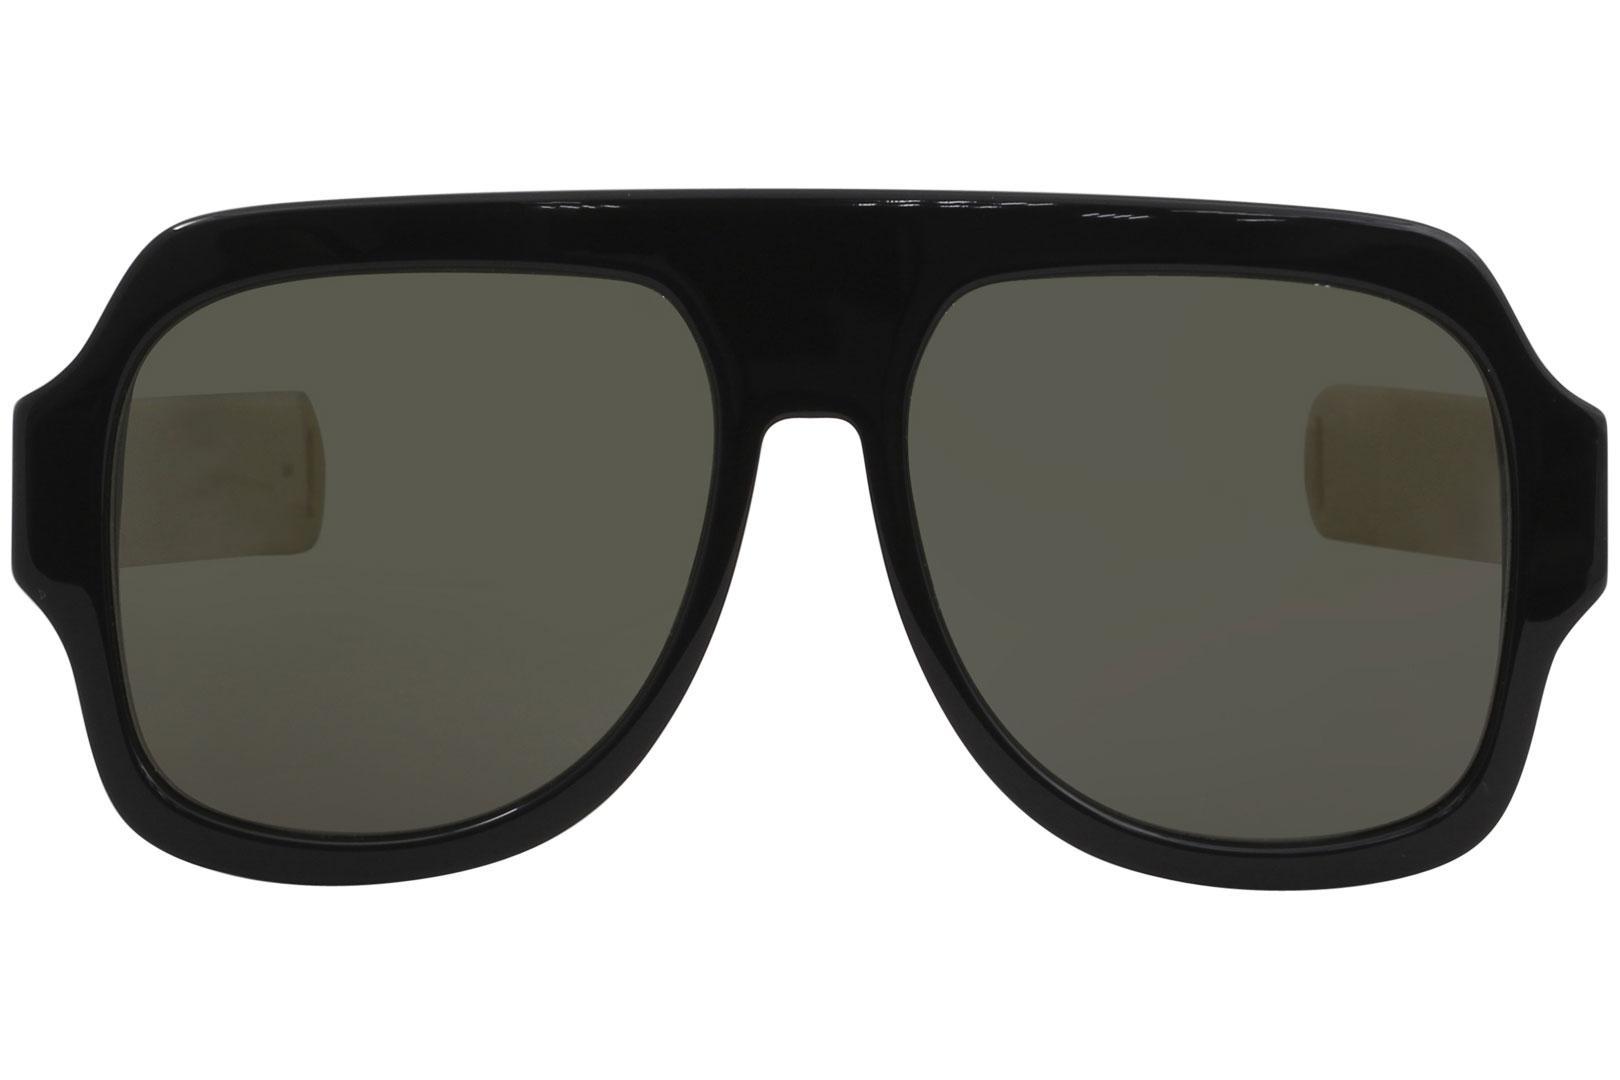 6d5221d228 Gucci Men s GG0255S GG 0255 S Fashion Pilot Sunglasses